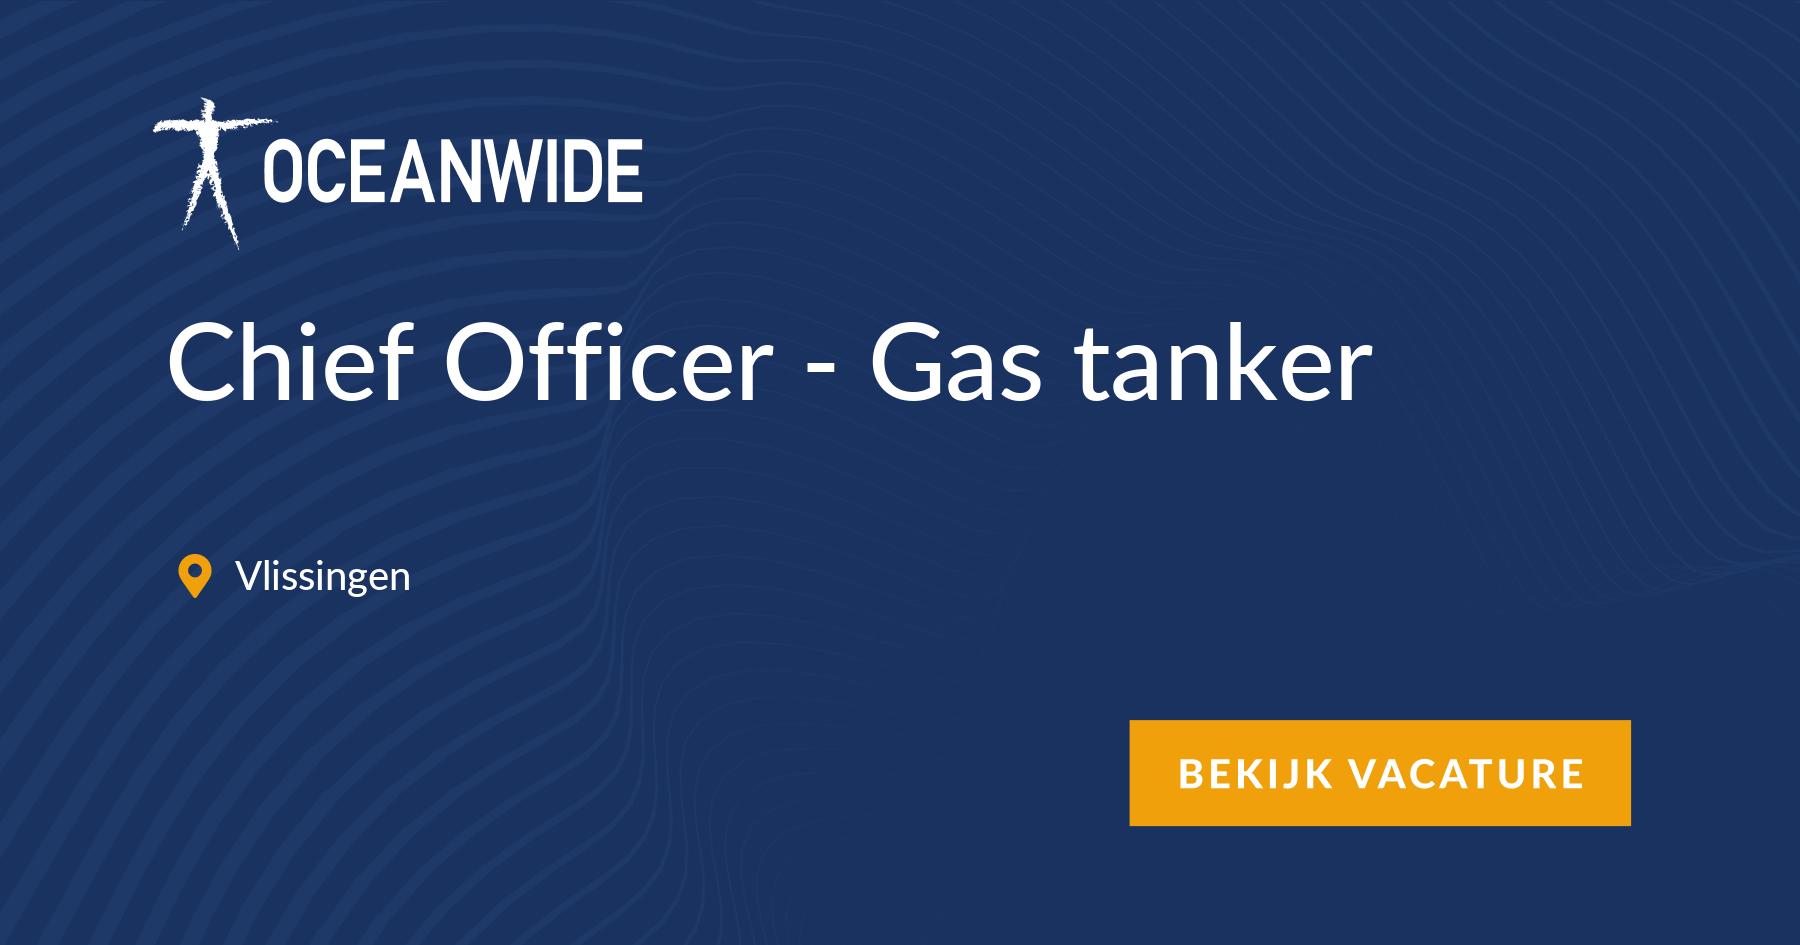 Chief Officer - Gas tanker, Vlissingen - maritime vacancy ~ Oceanwide